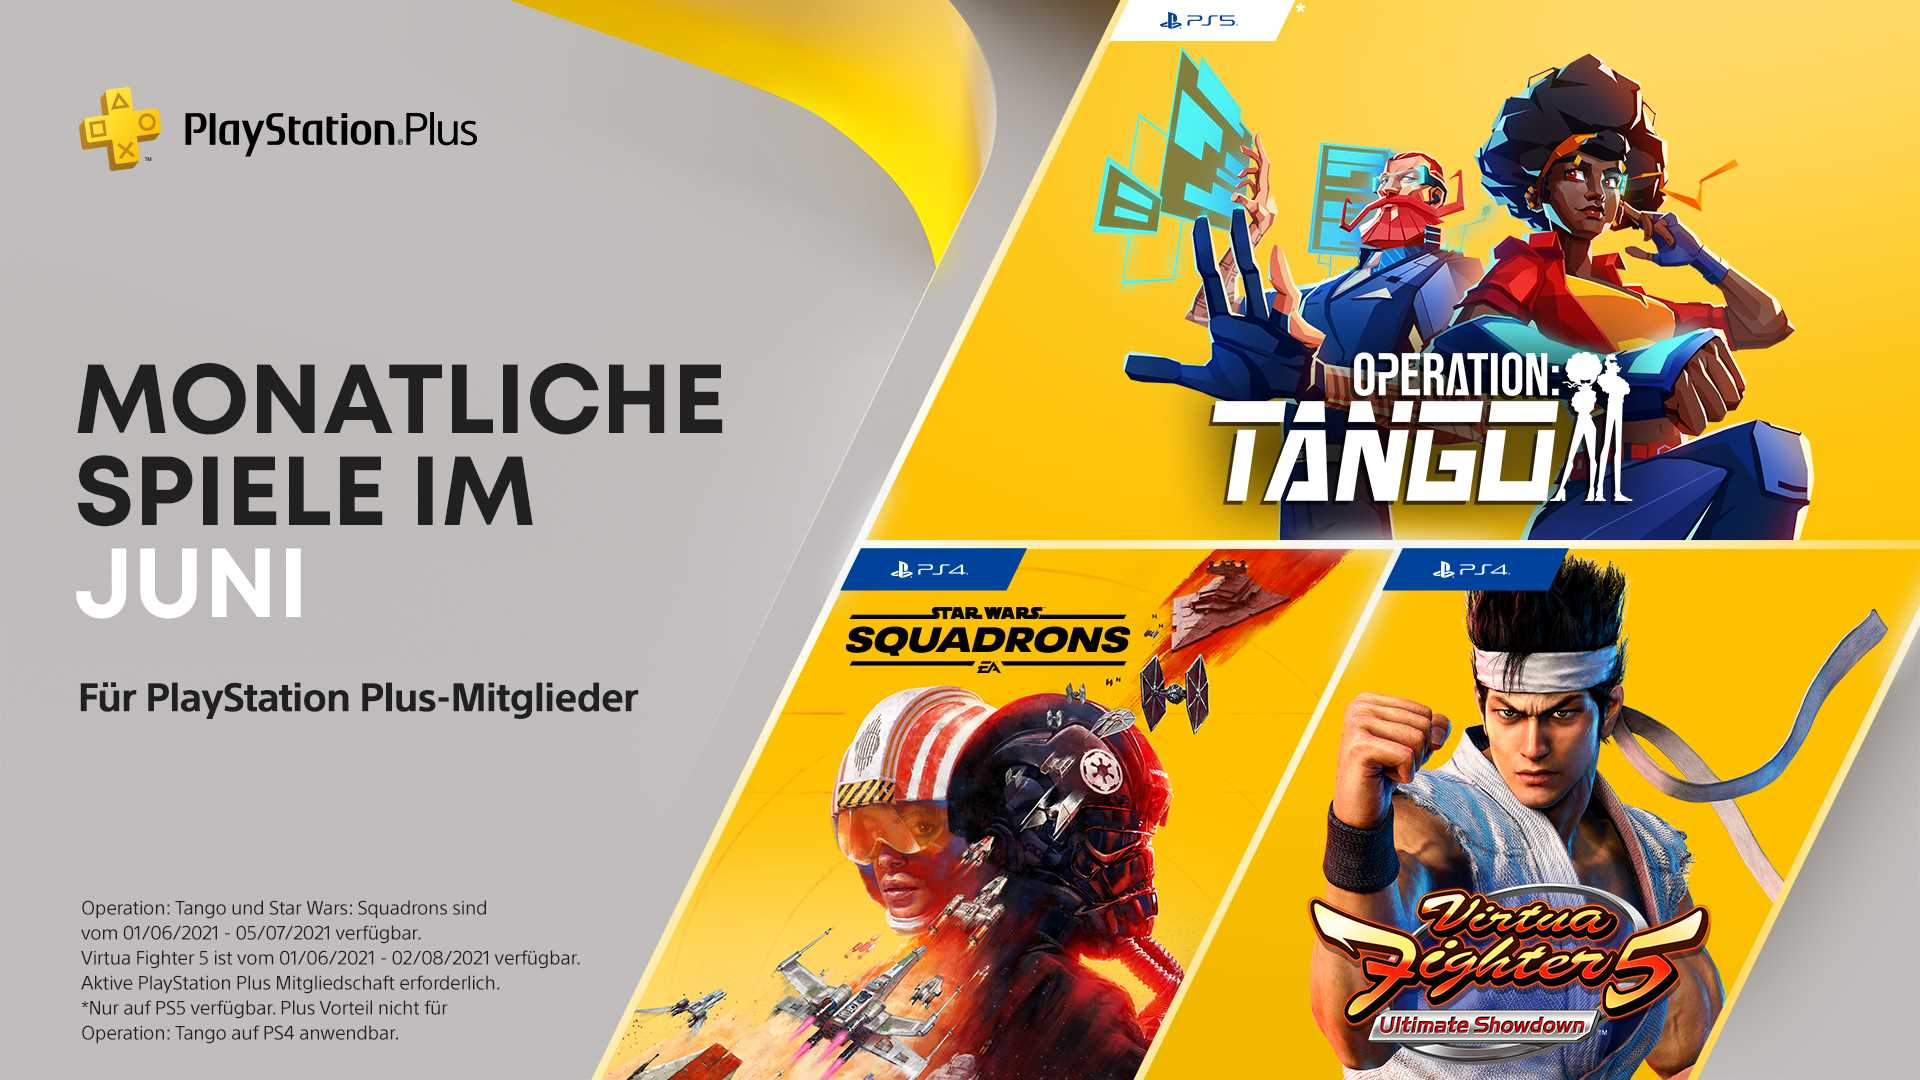 PlayStation Plus Juni 2021 - Key Art